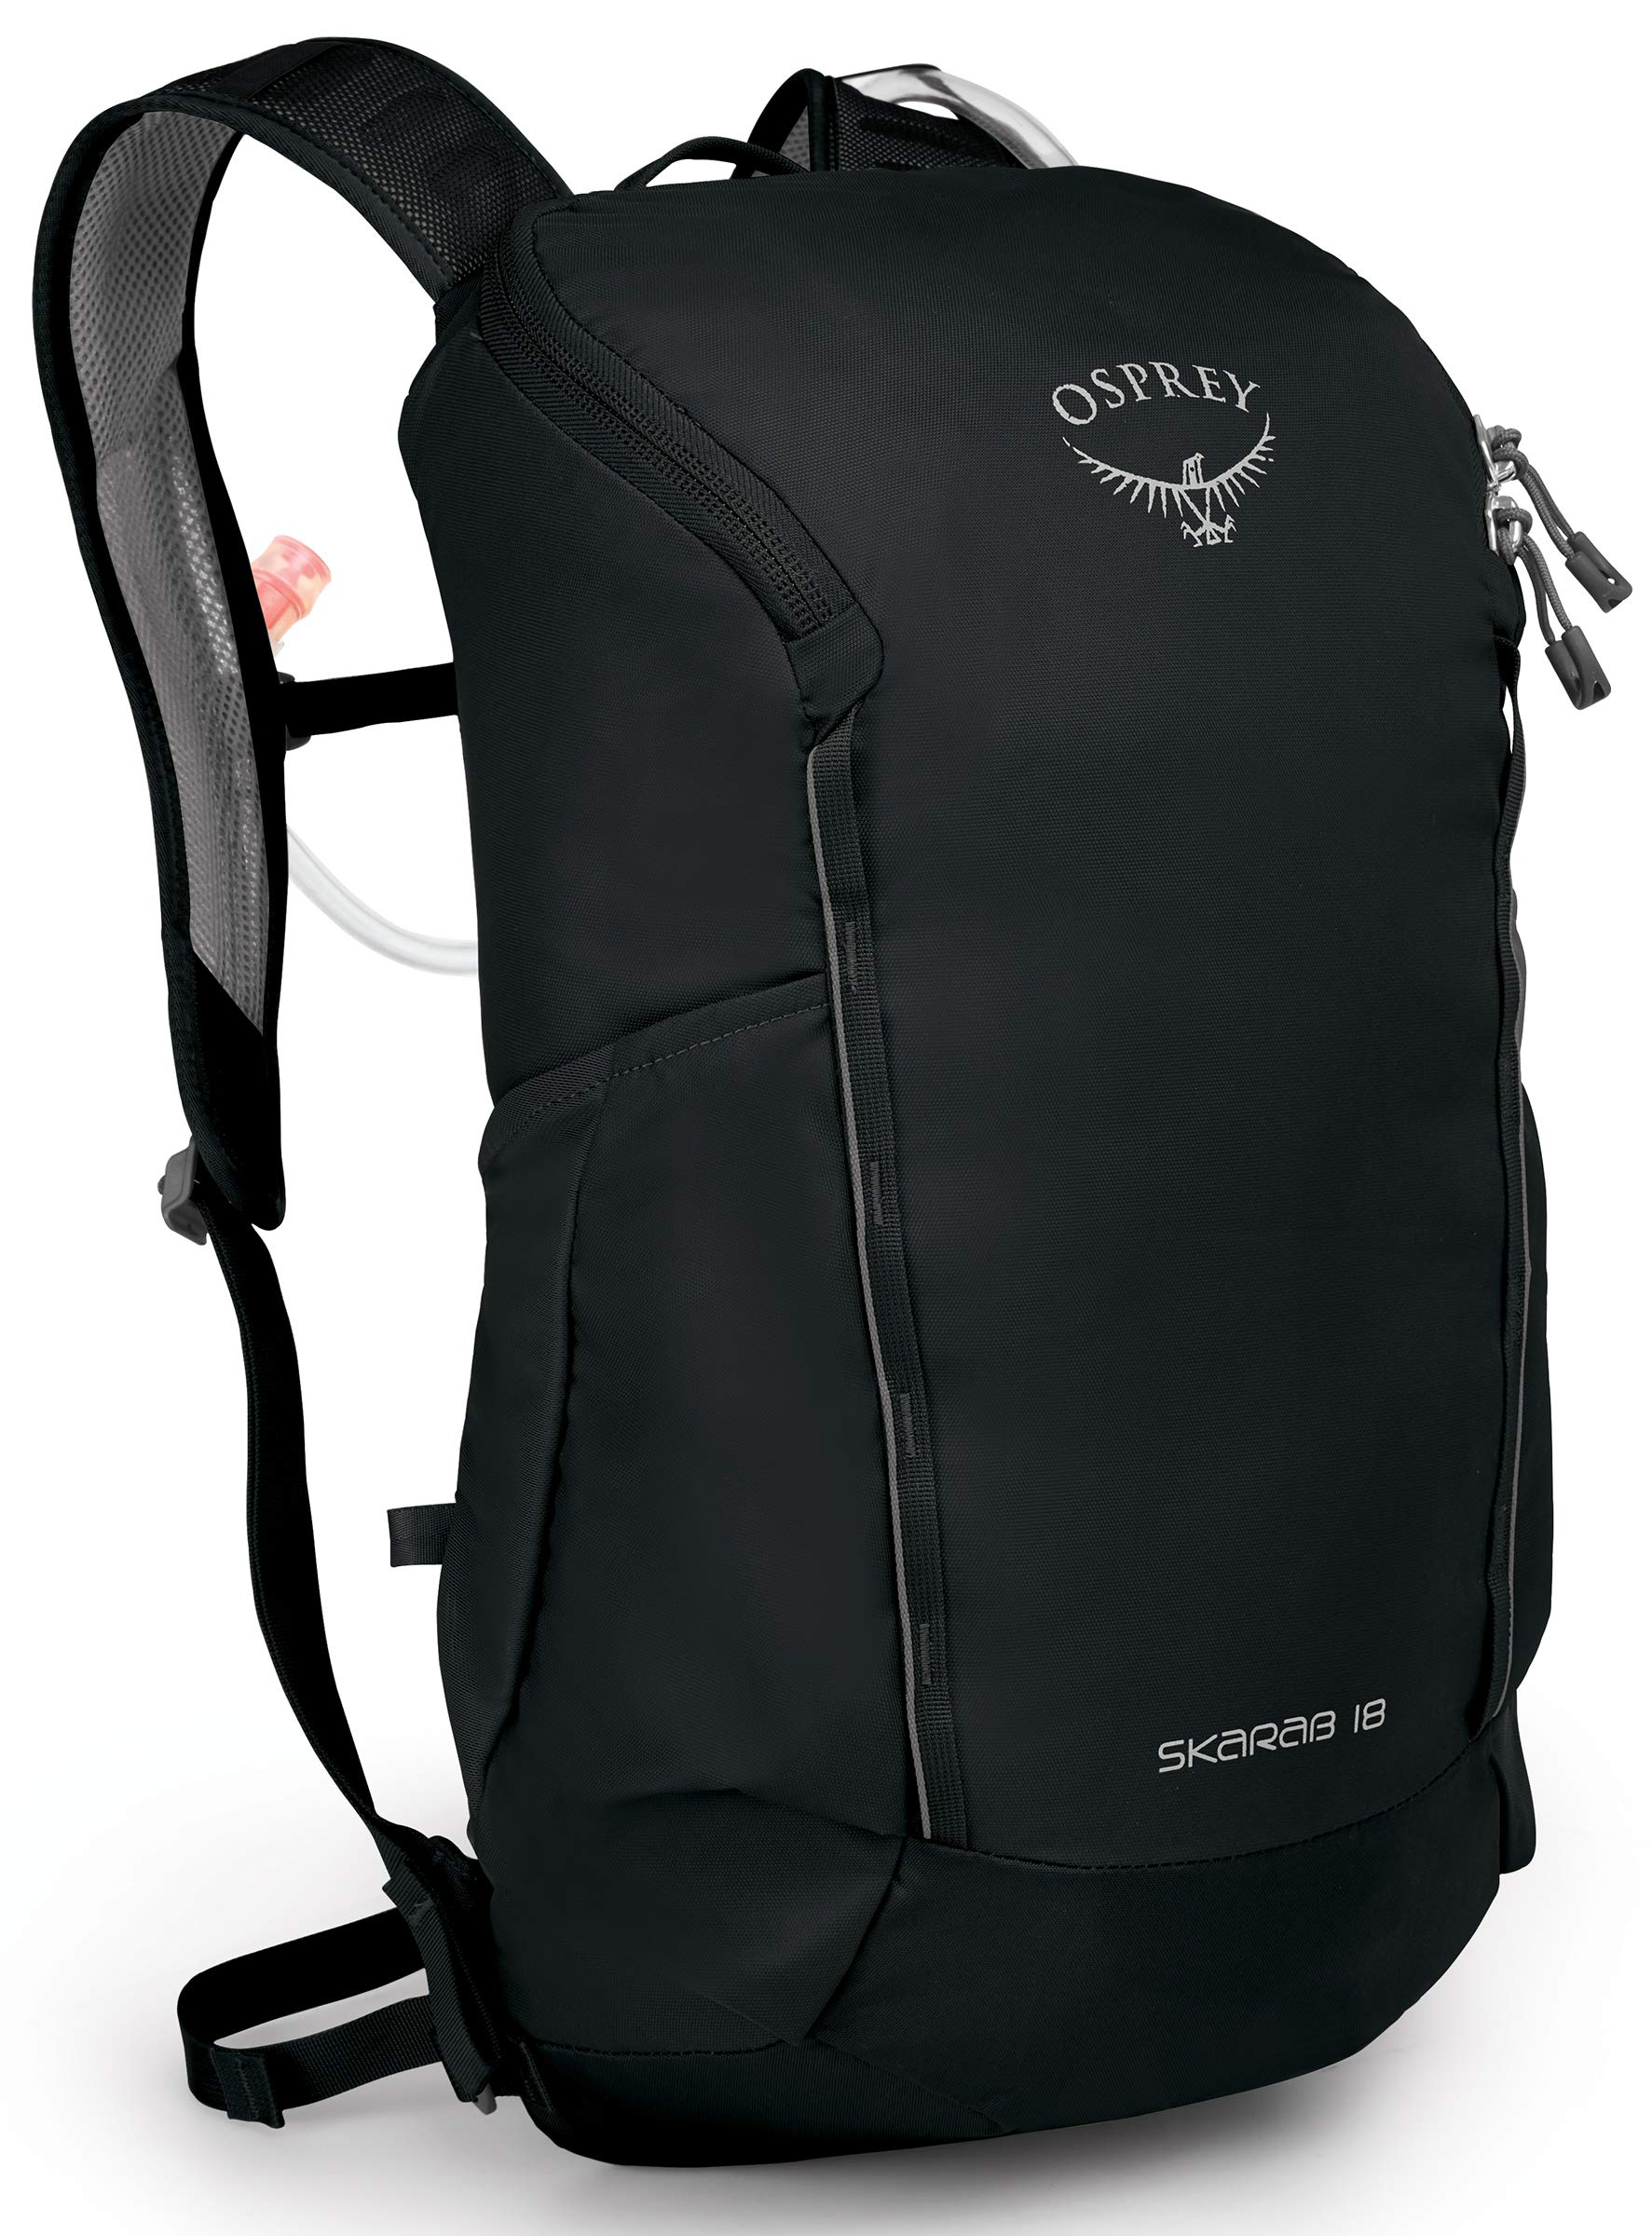 Osprey Packs Skarab 18 Hydration Pack, Black, One Size